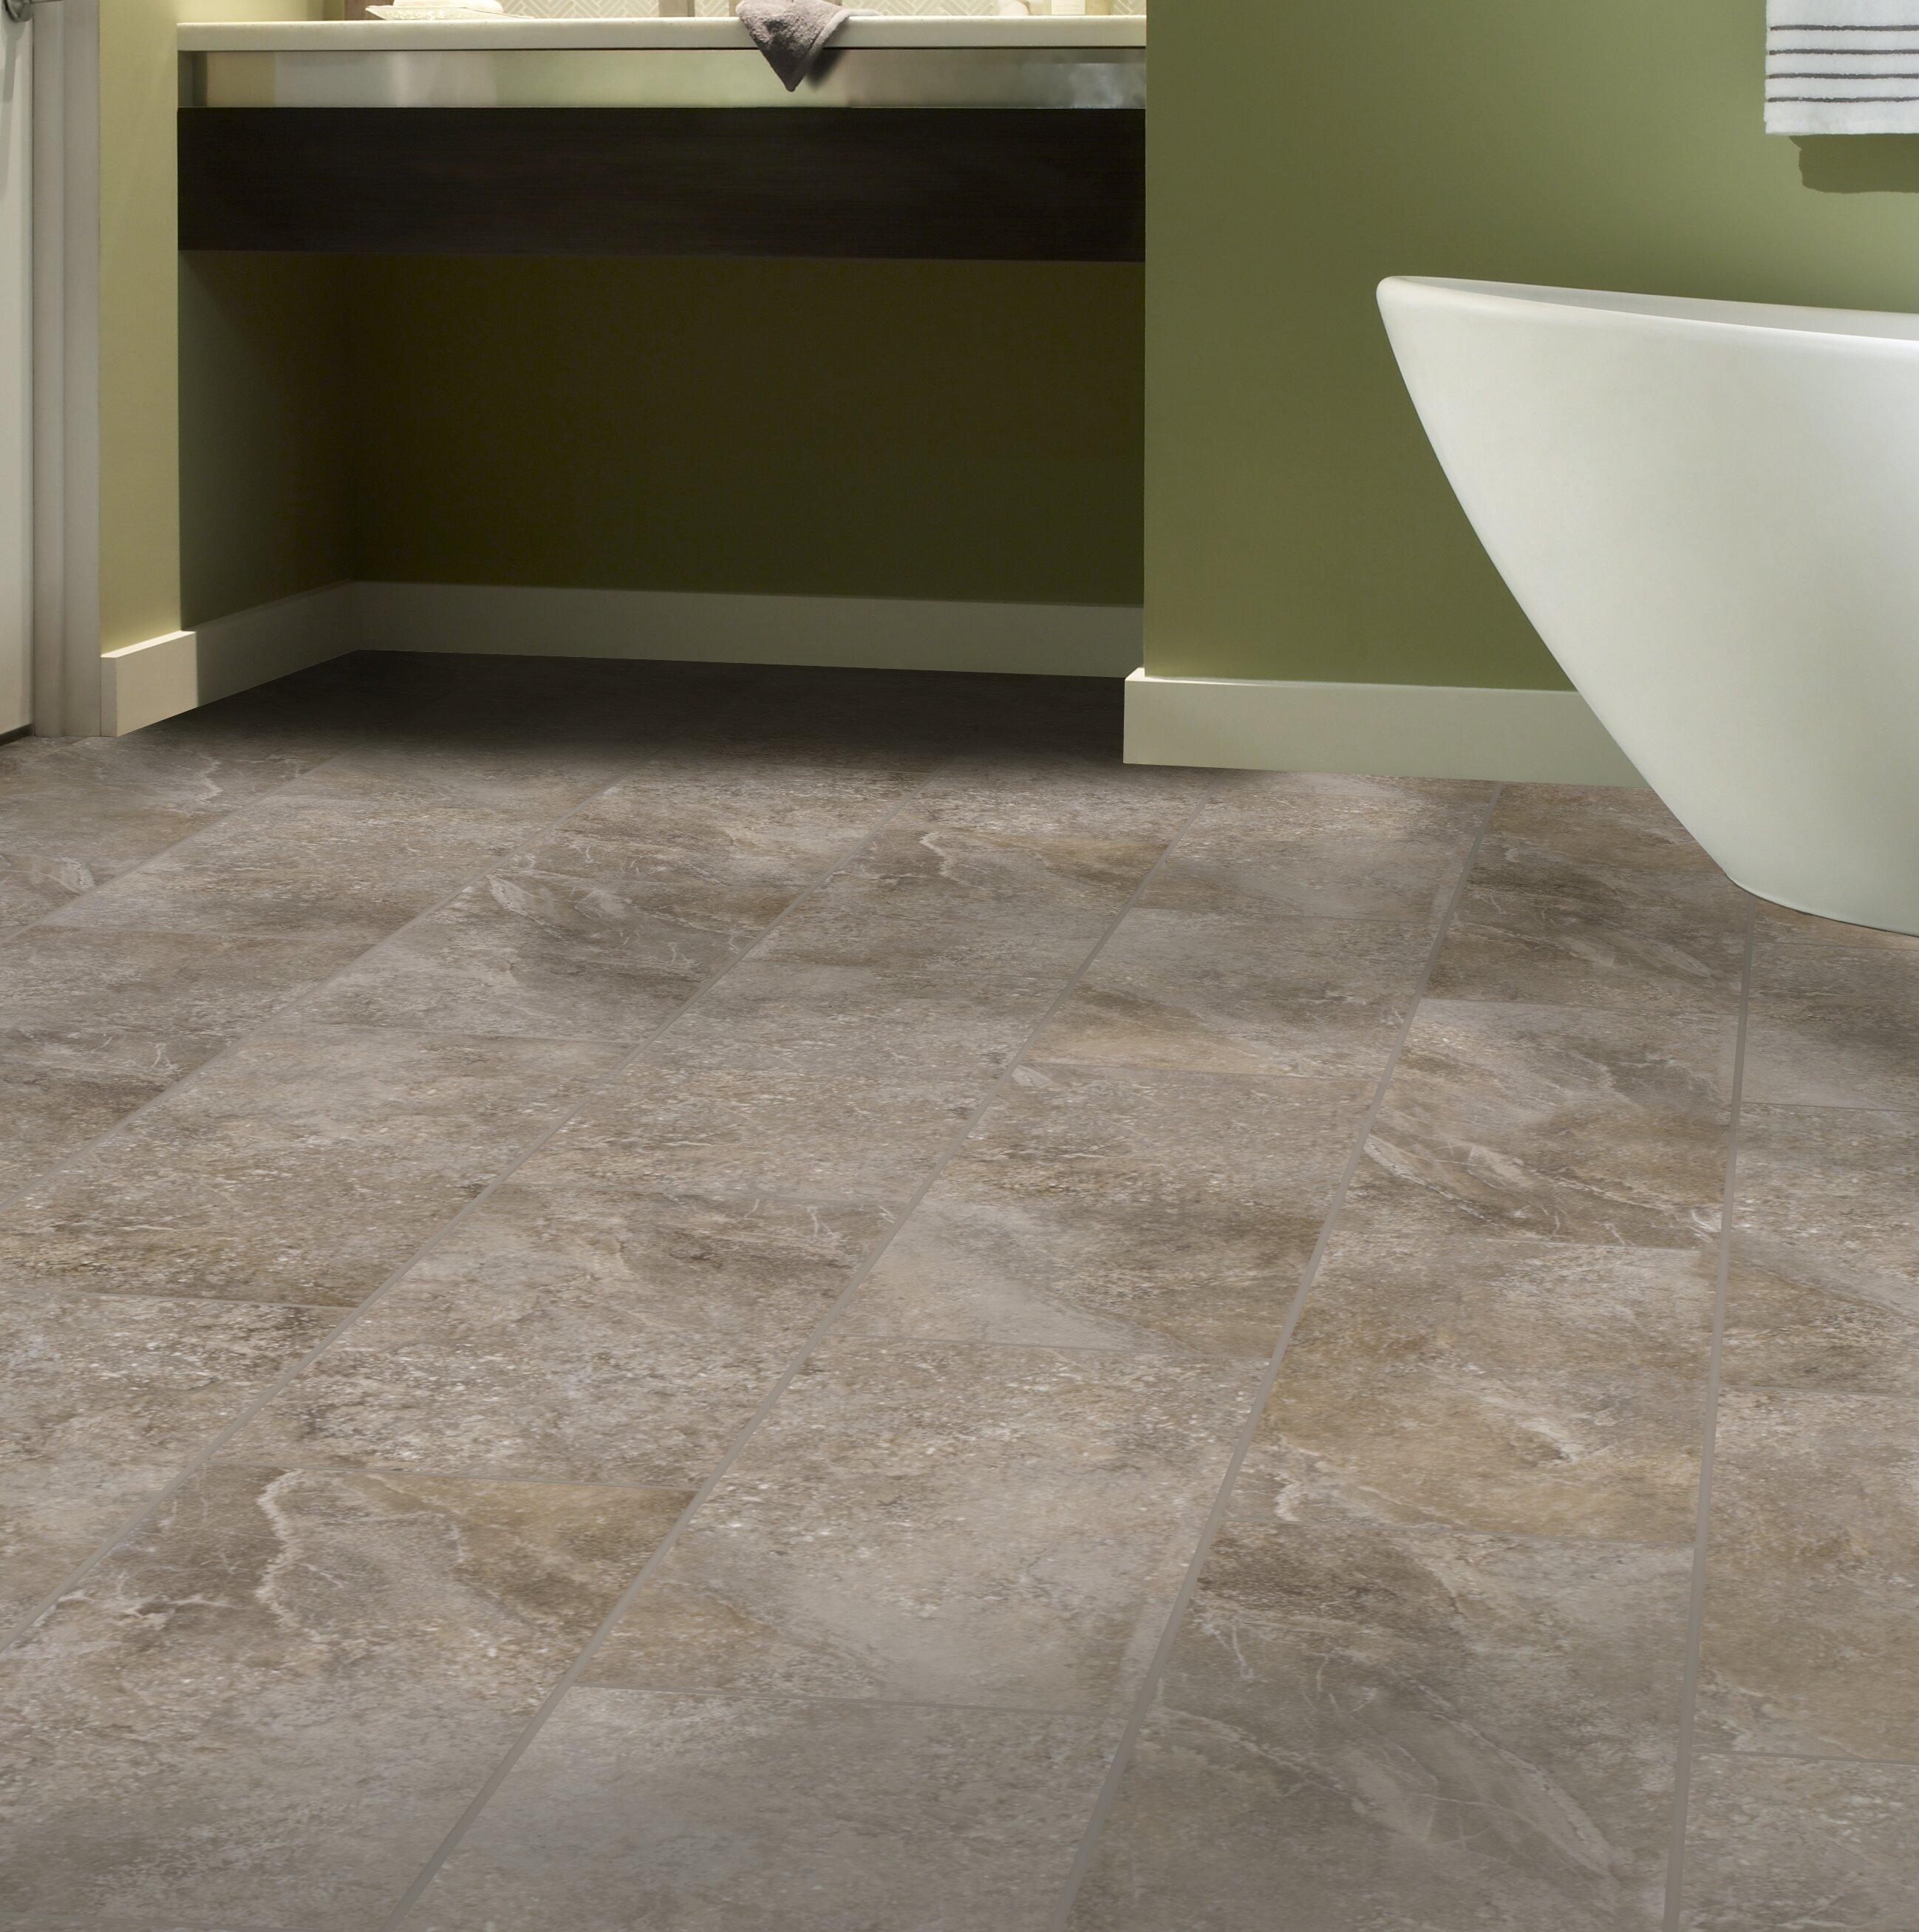 Mannington adura flex athena 12 x 24 x 2 5mm luxury vinyl tile wayfair